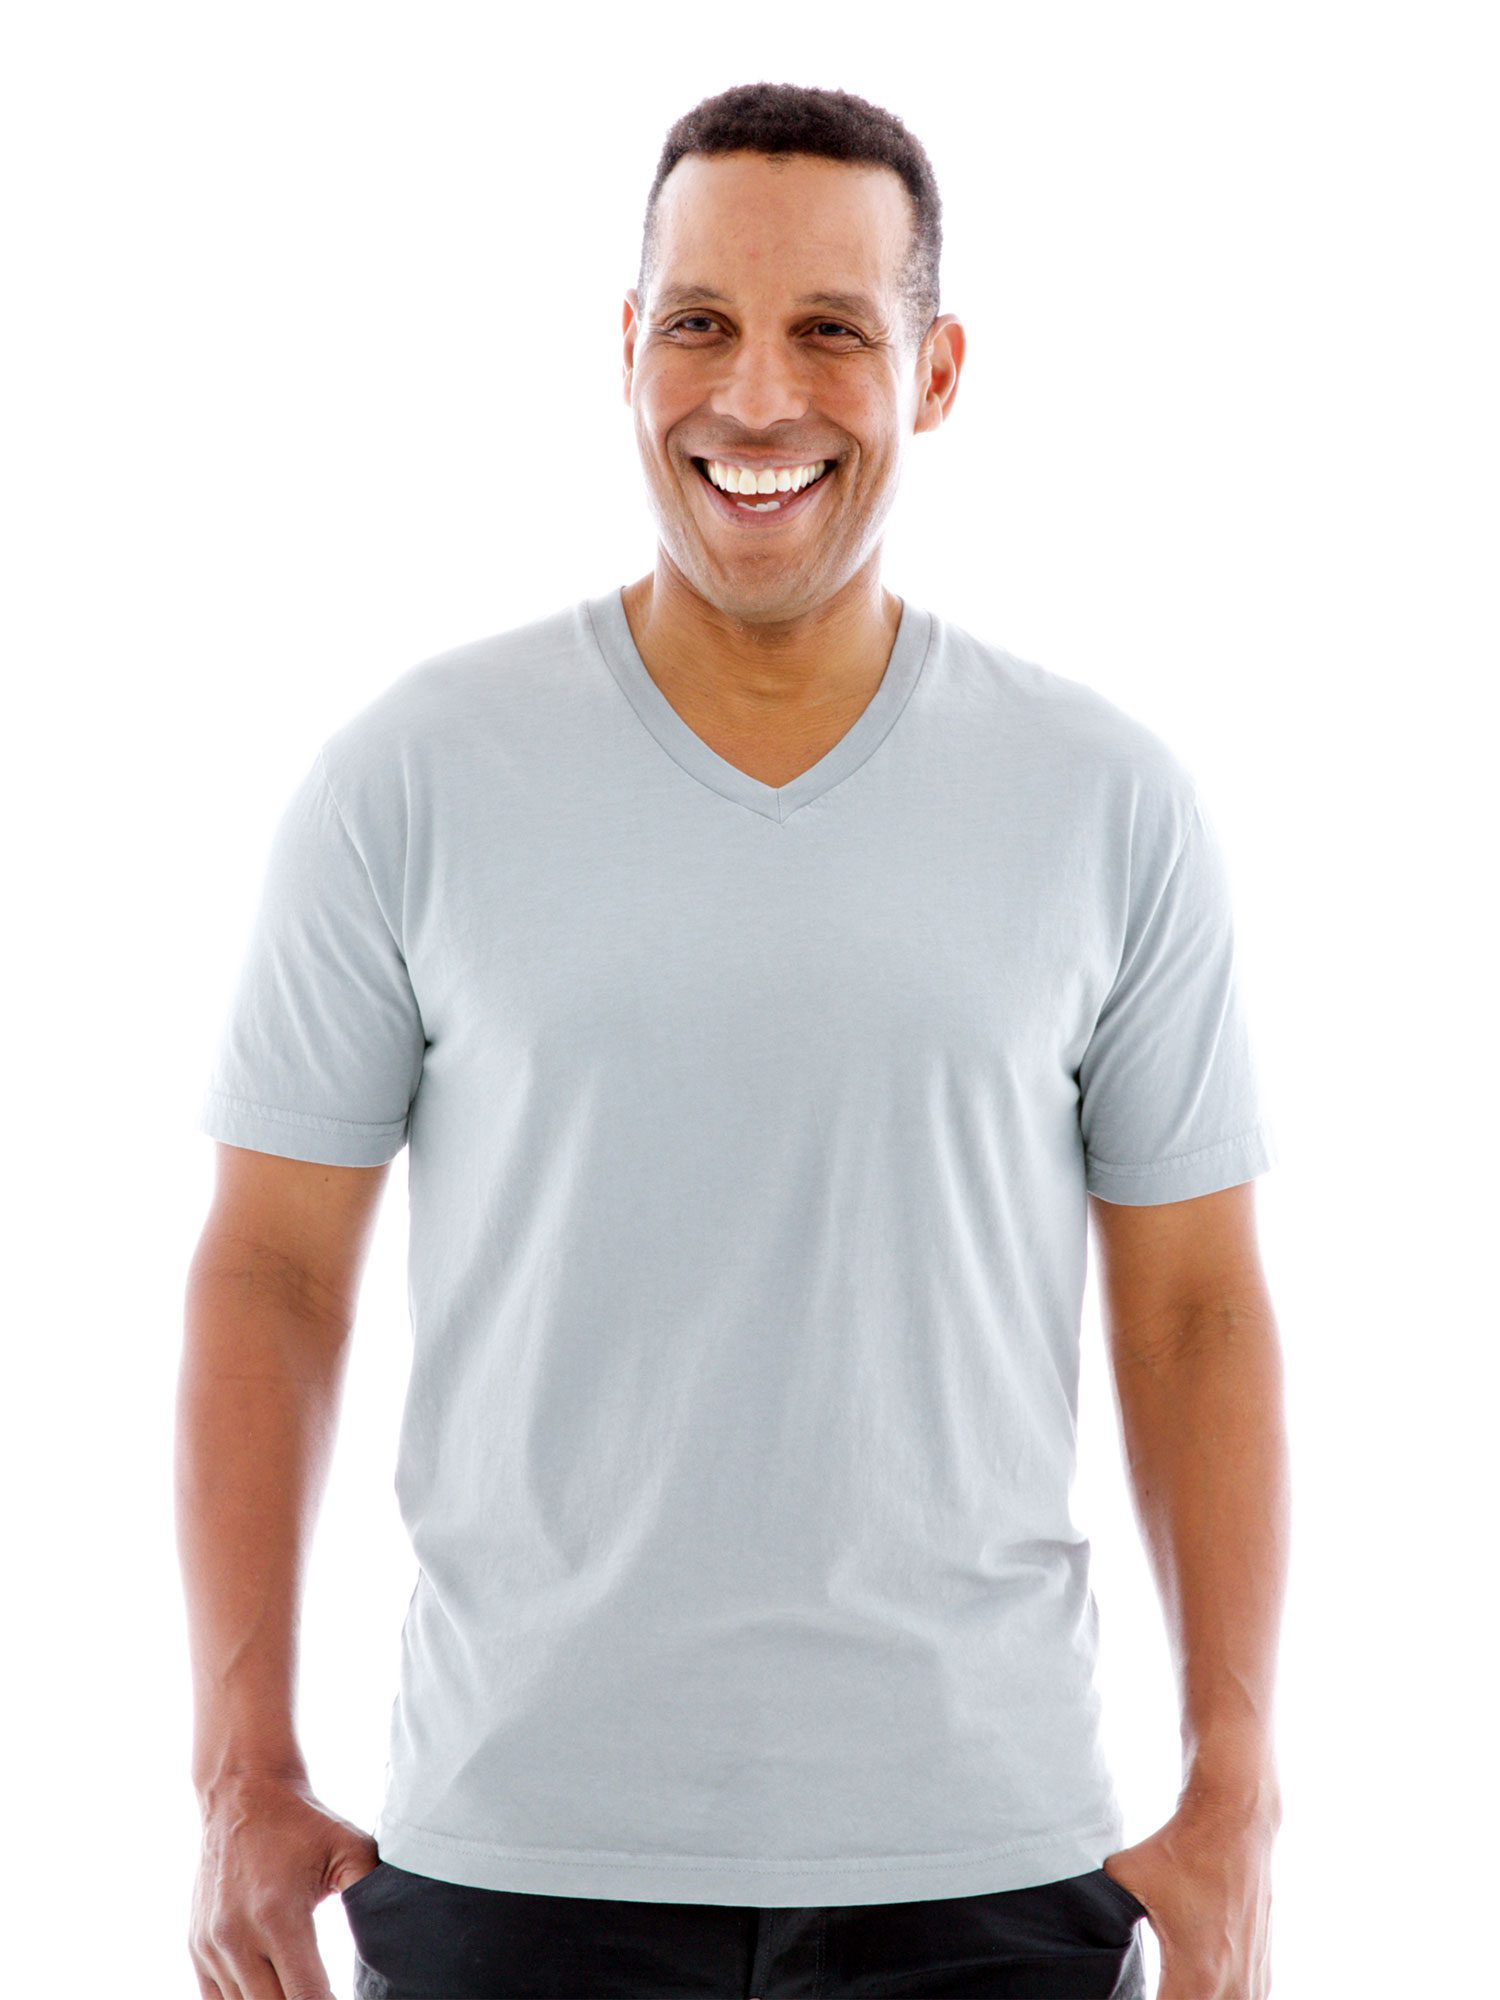 Fine Jersey V-neck Custom Printed T-Shirt